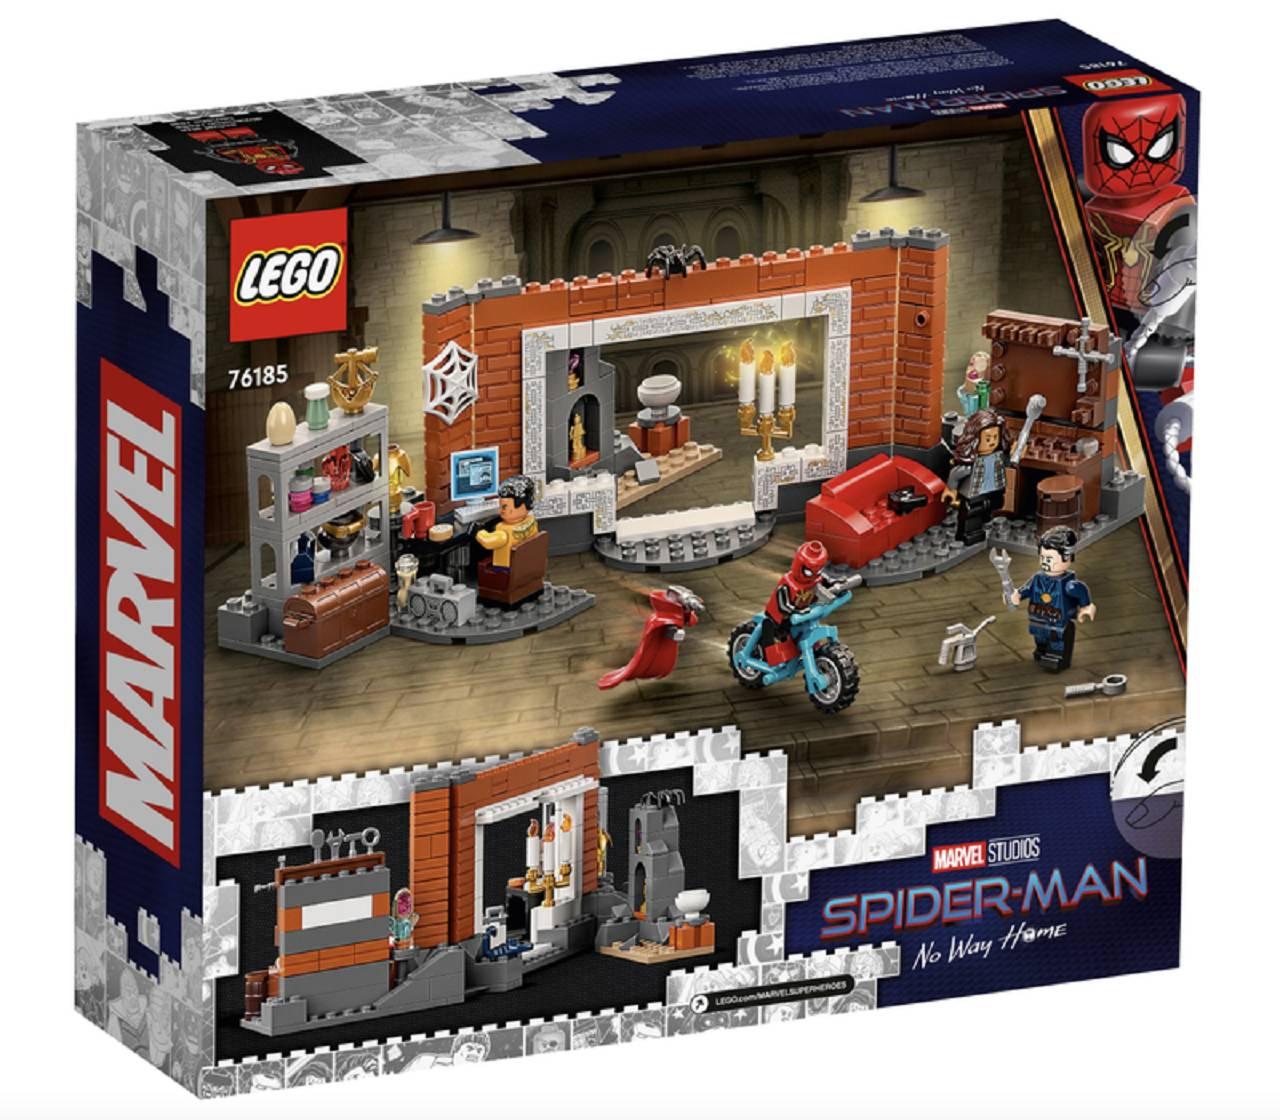 Taraji Spider-Man Legos Spider-Man No Way Home Doctor Strange